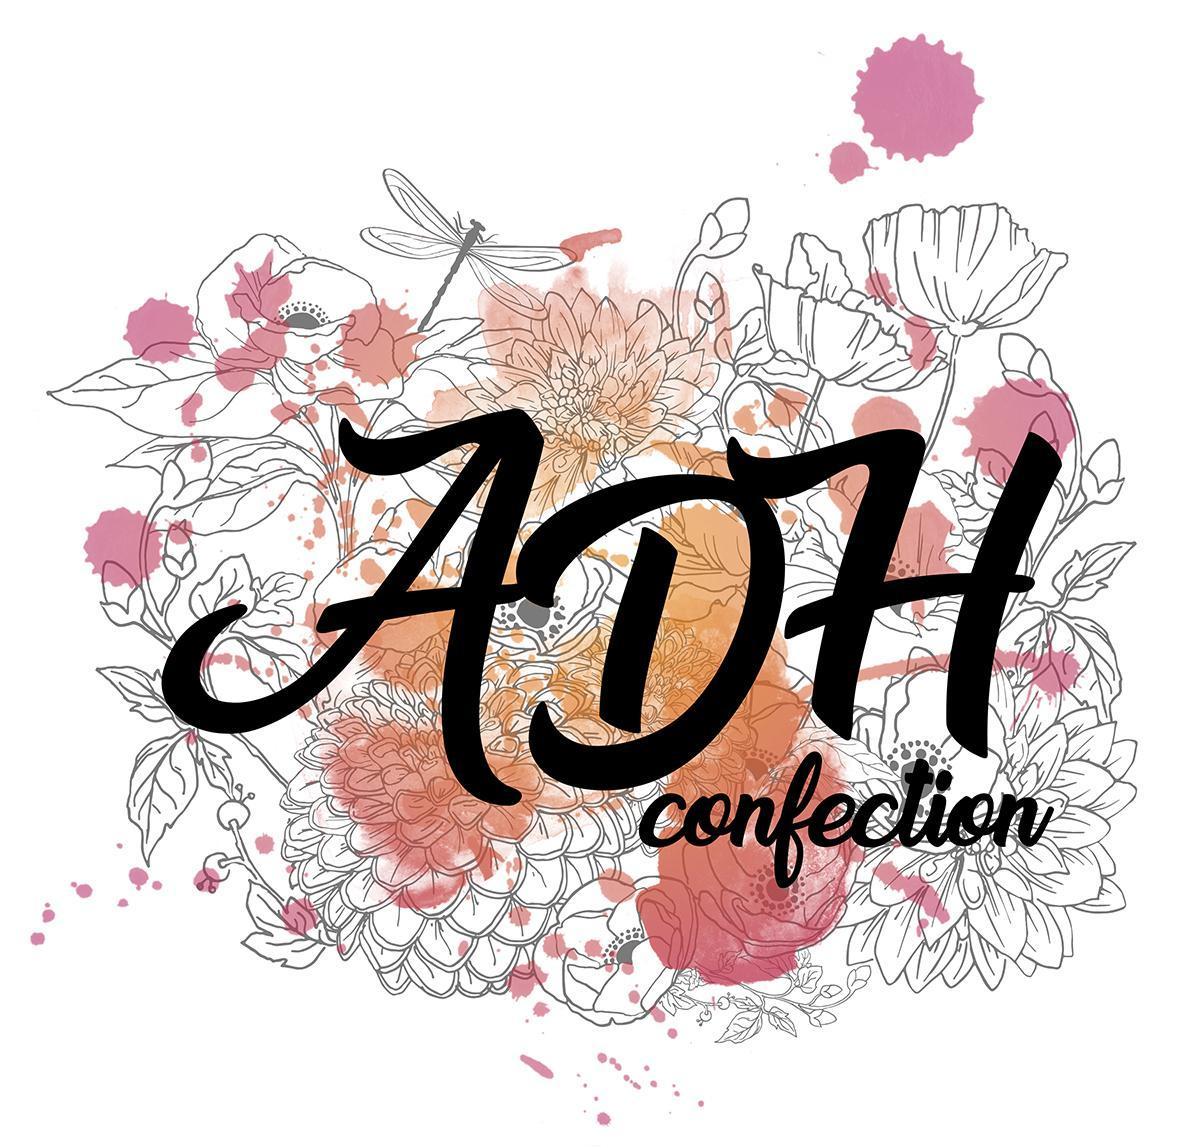 ADH confection